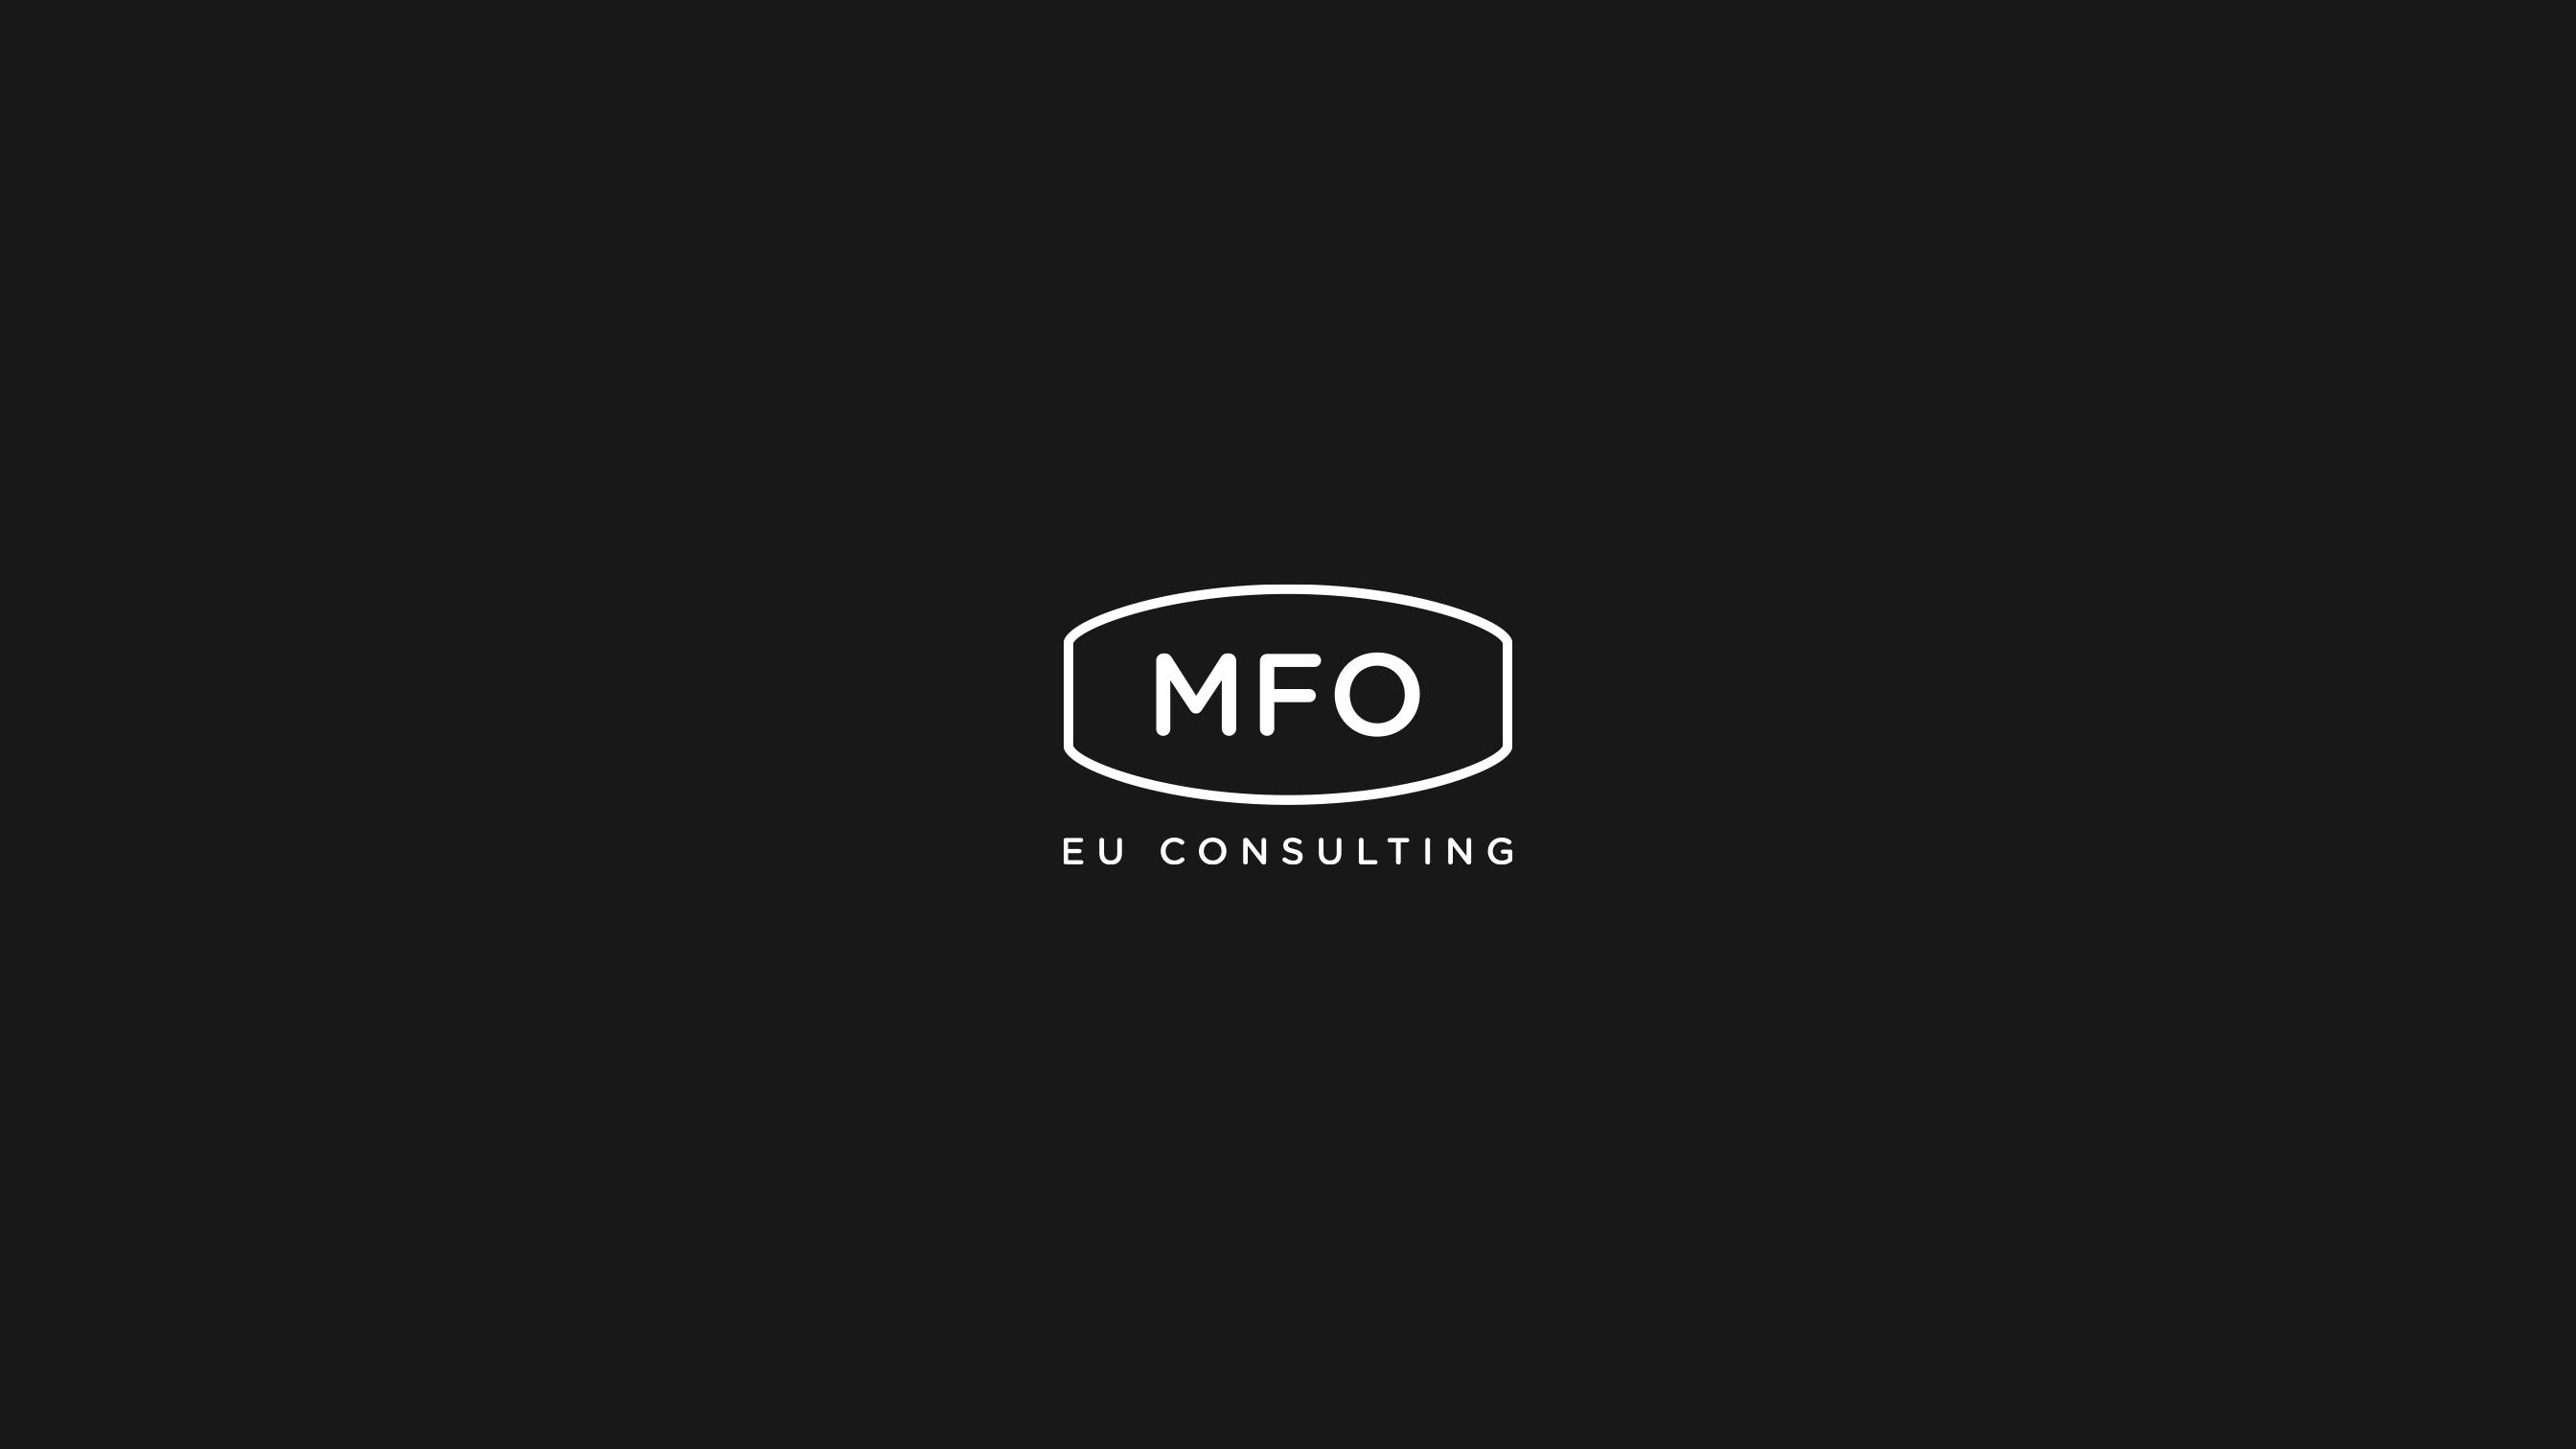 showcase-logotype-mfo